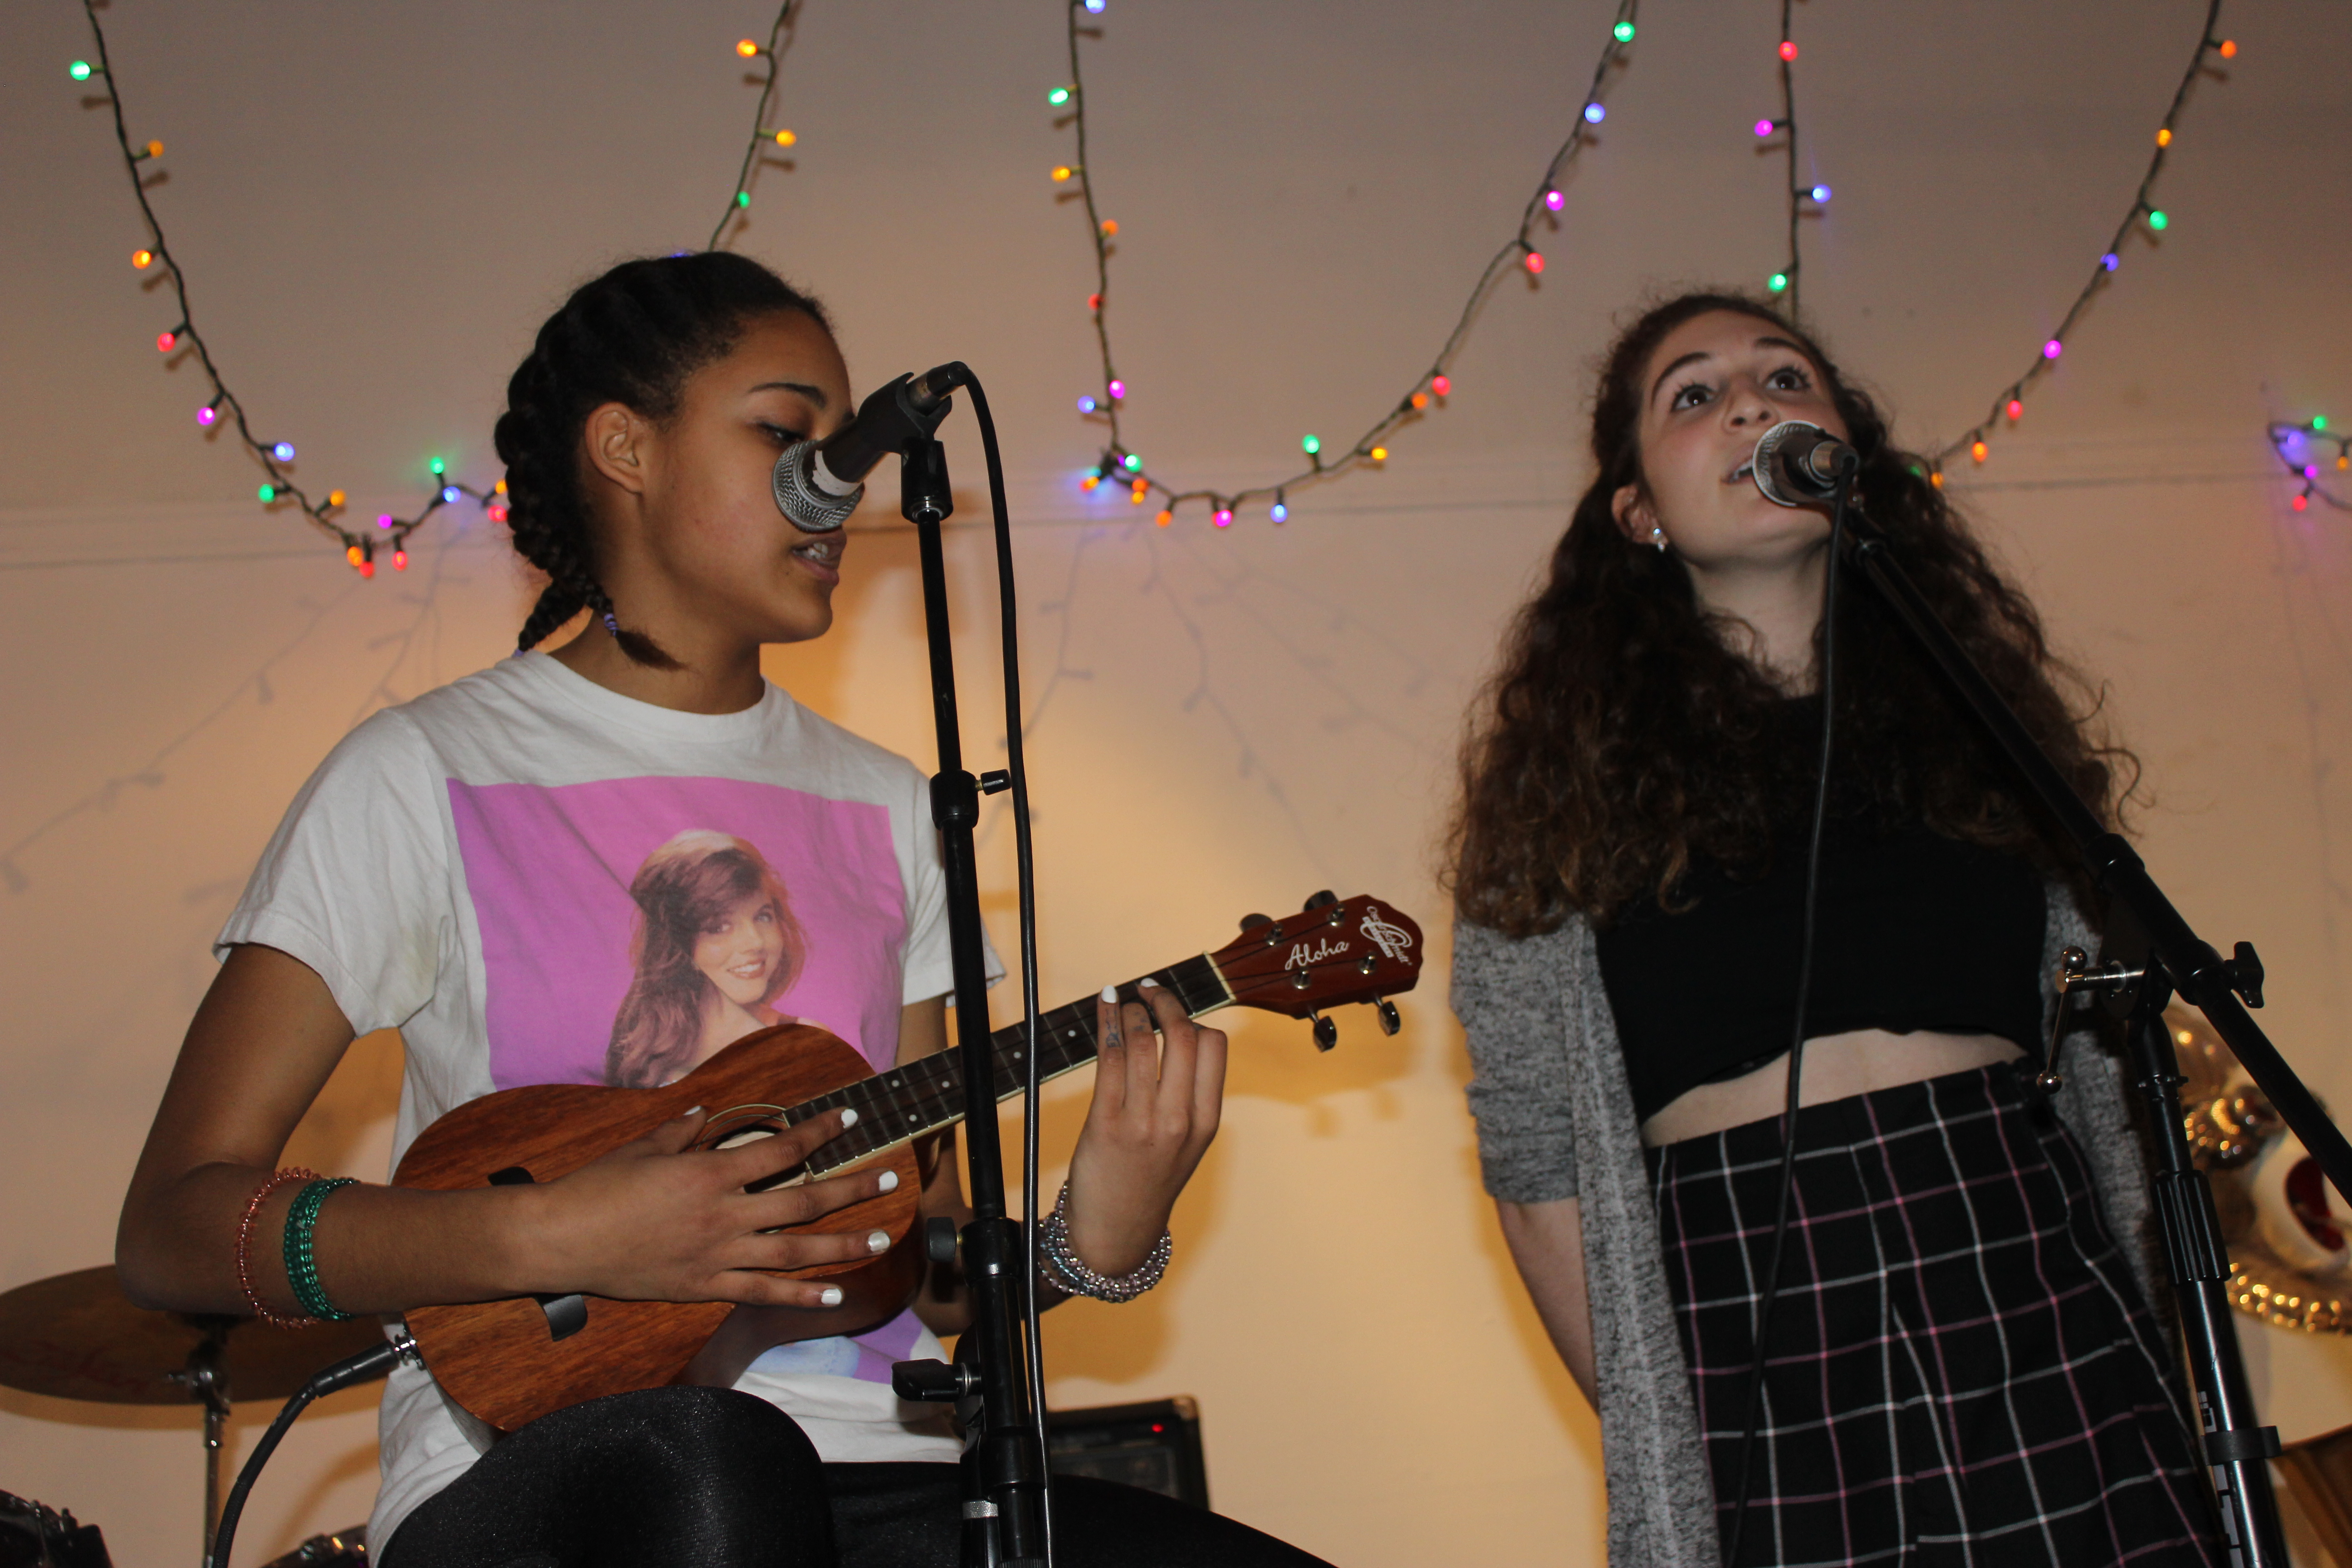 Safiya Sirota and Maddie Dolinsky